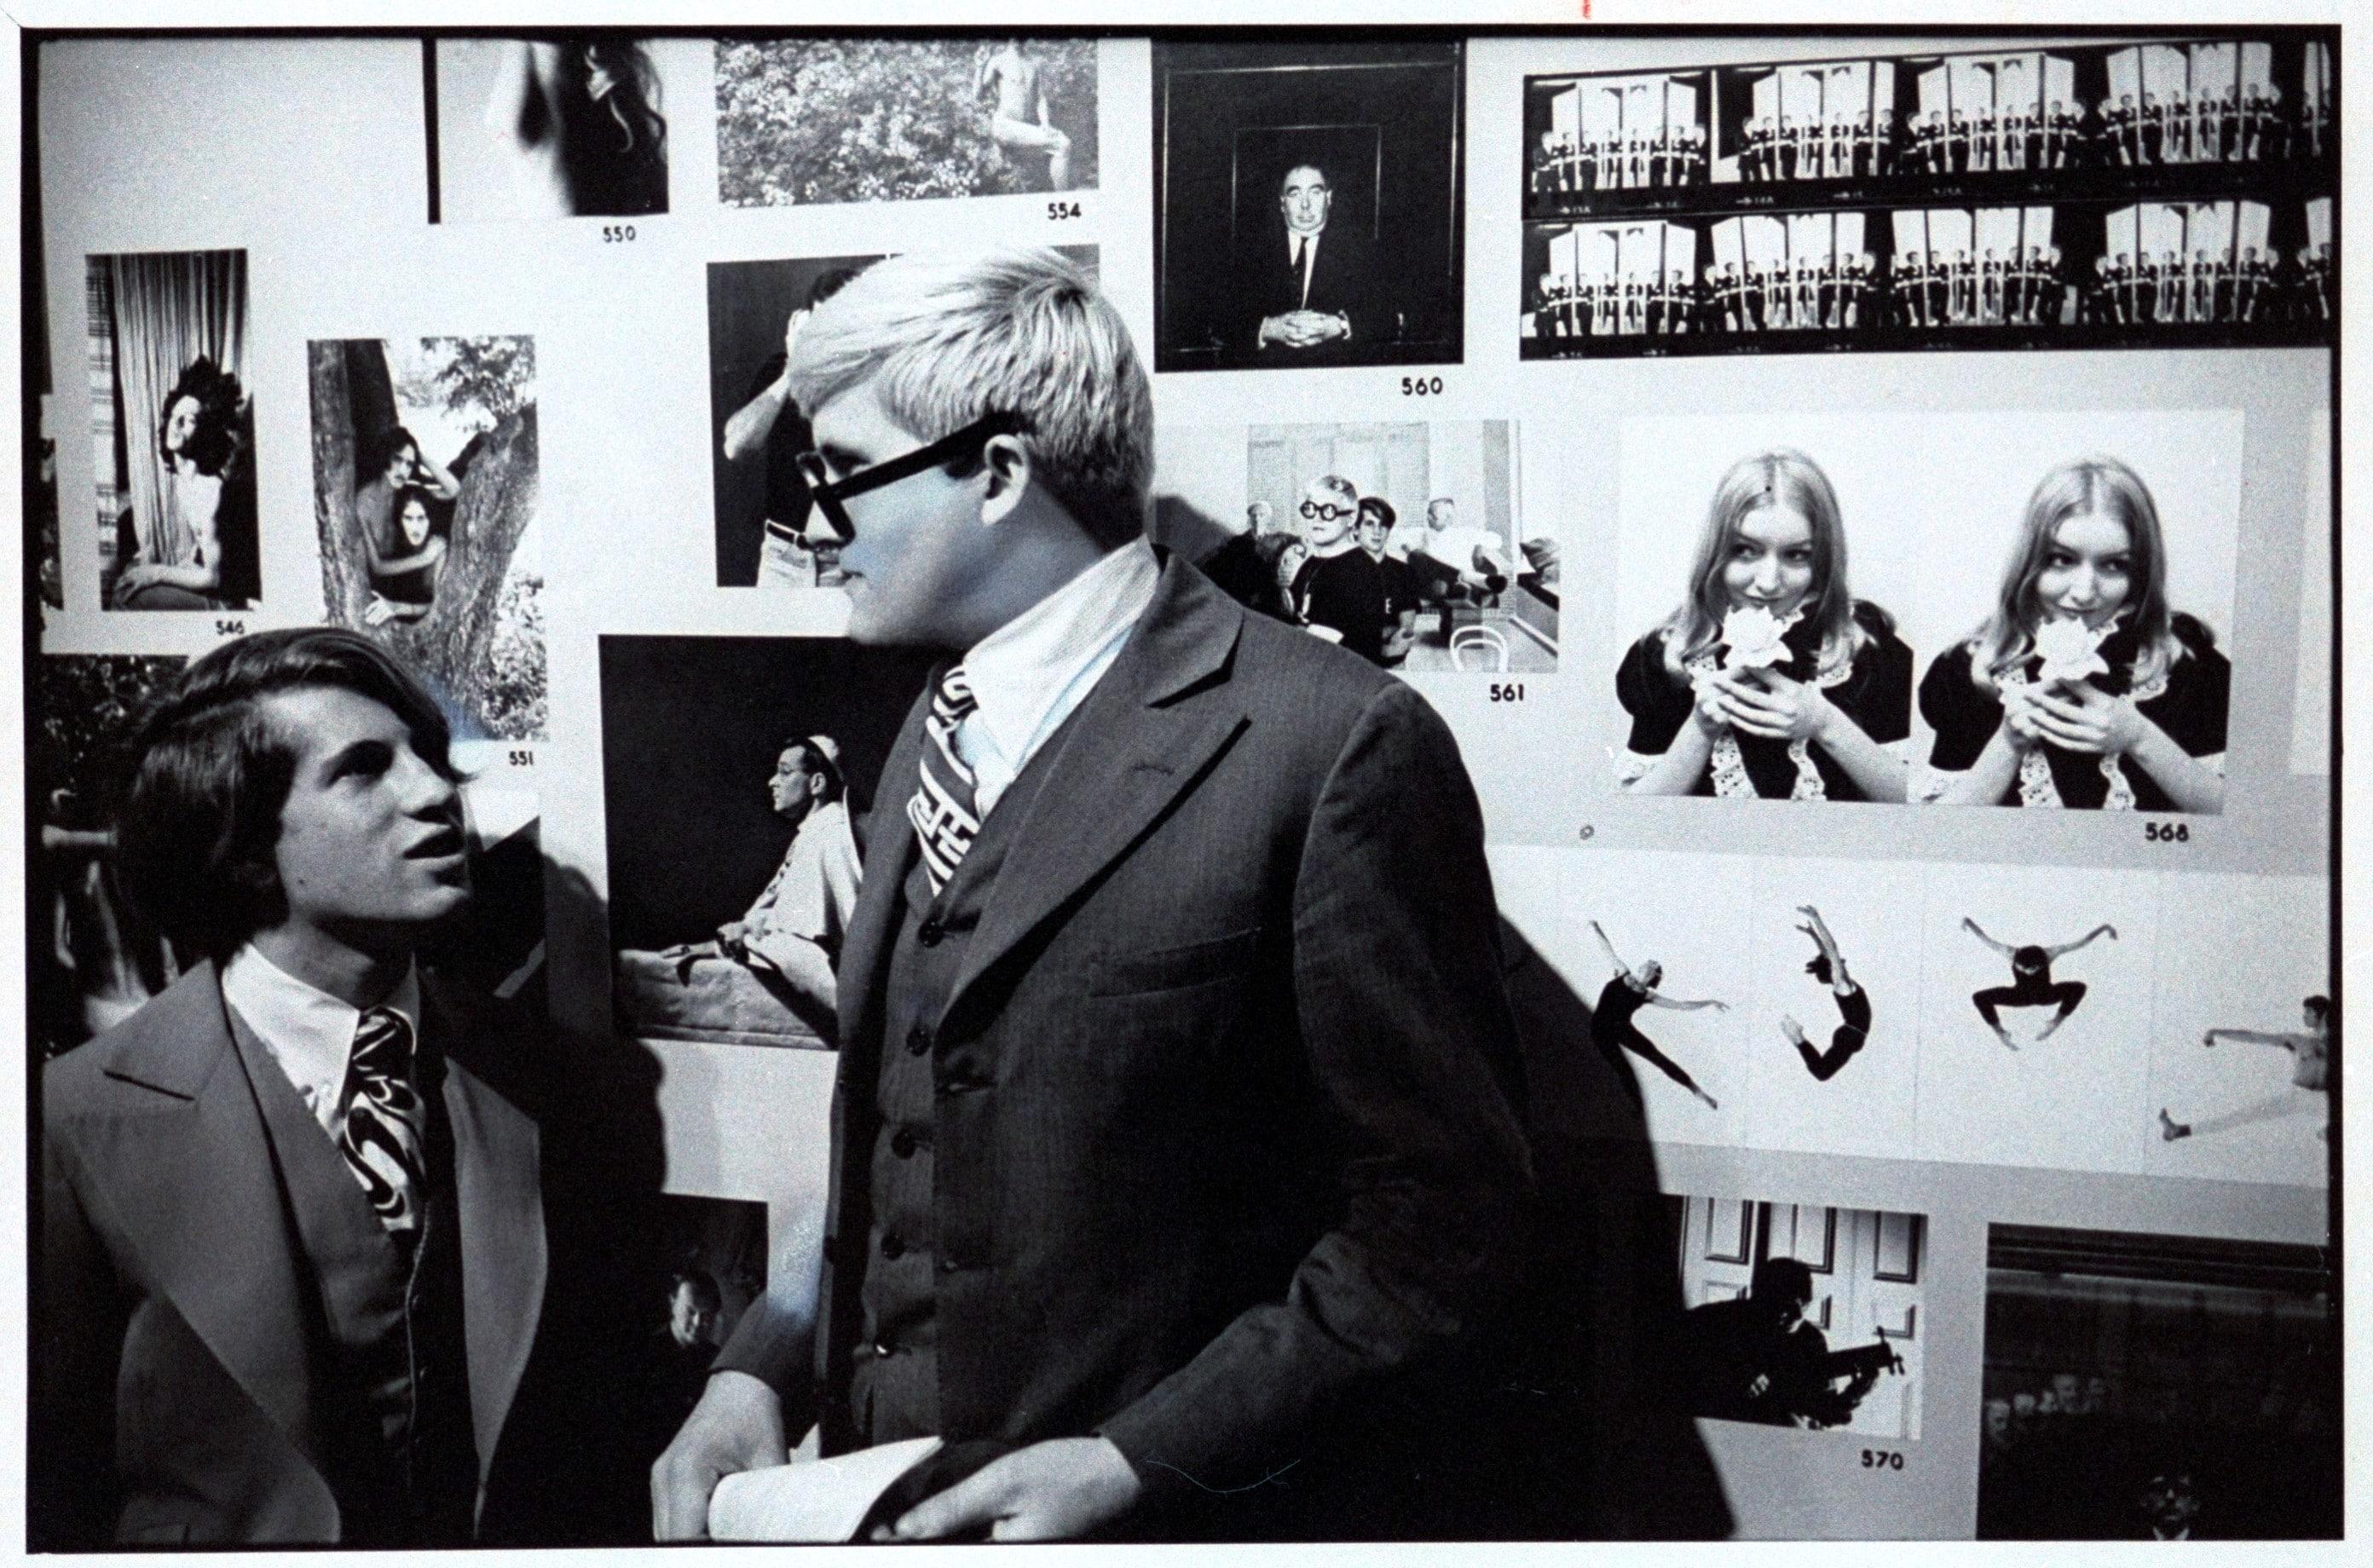 David Hockney with Peter Schlesinger